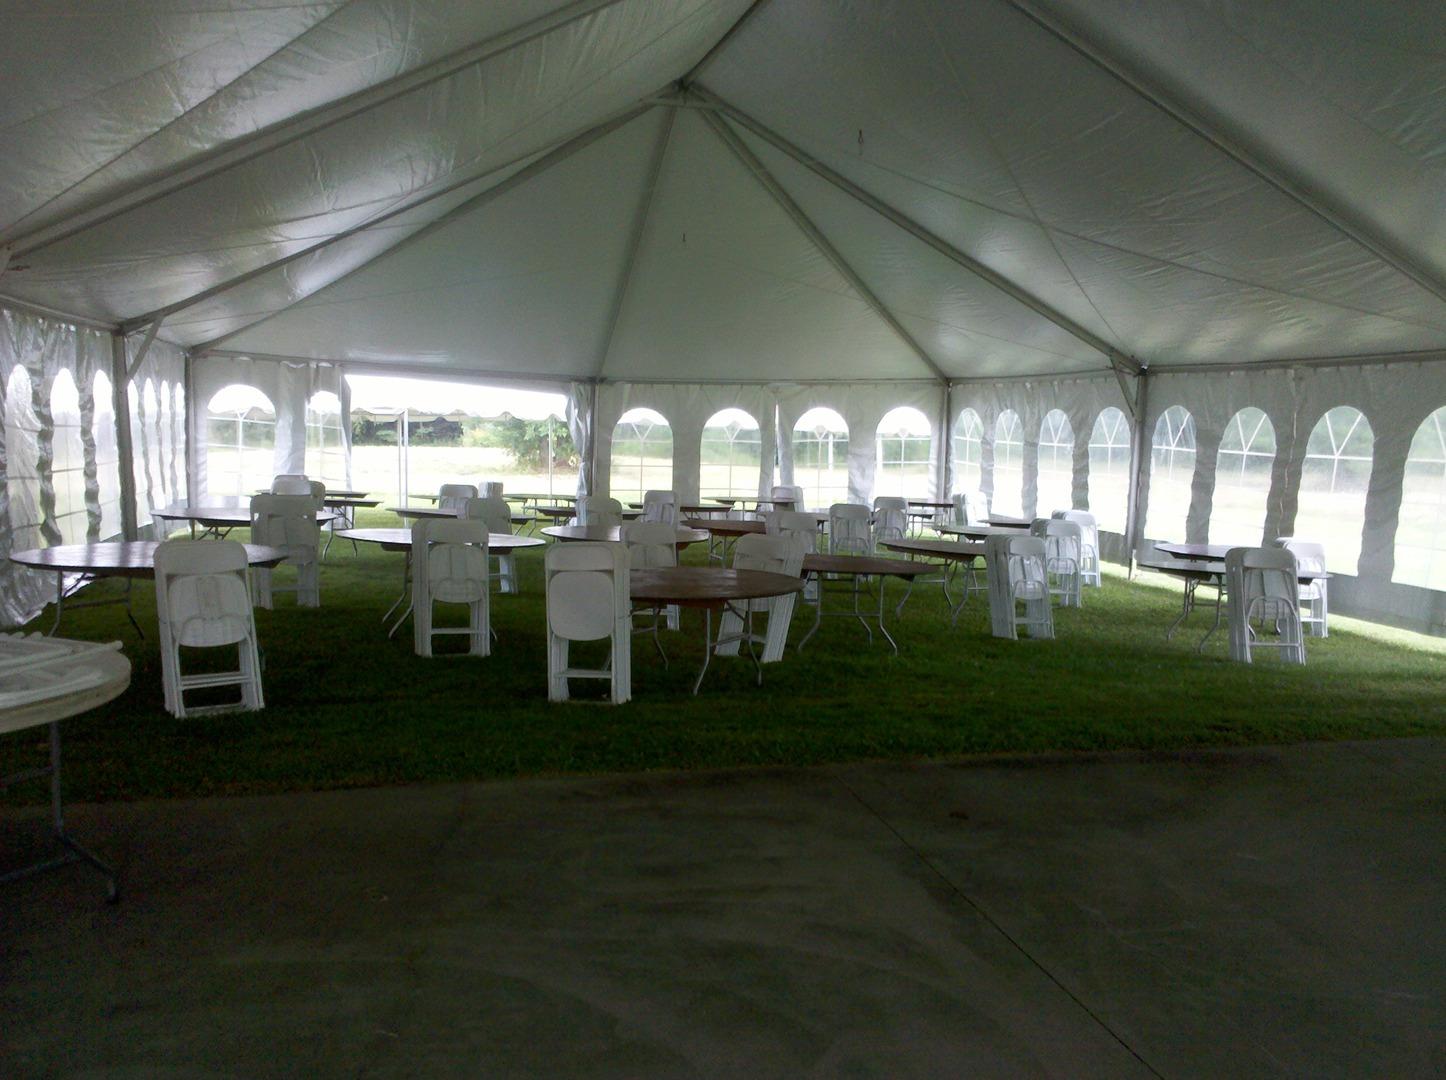 Party Rentals, tent rental, chair rental, wedding tent